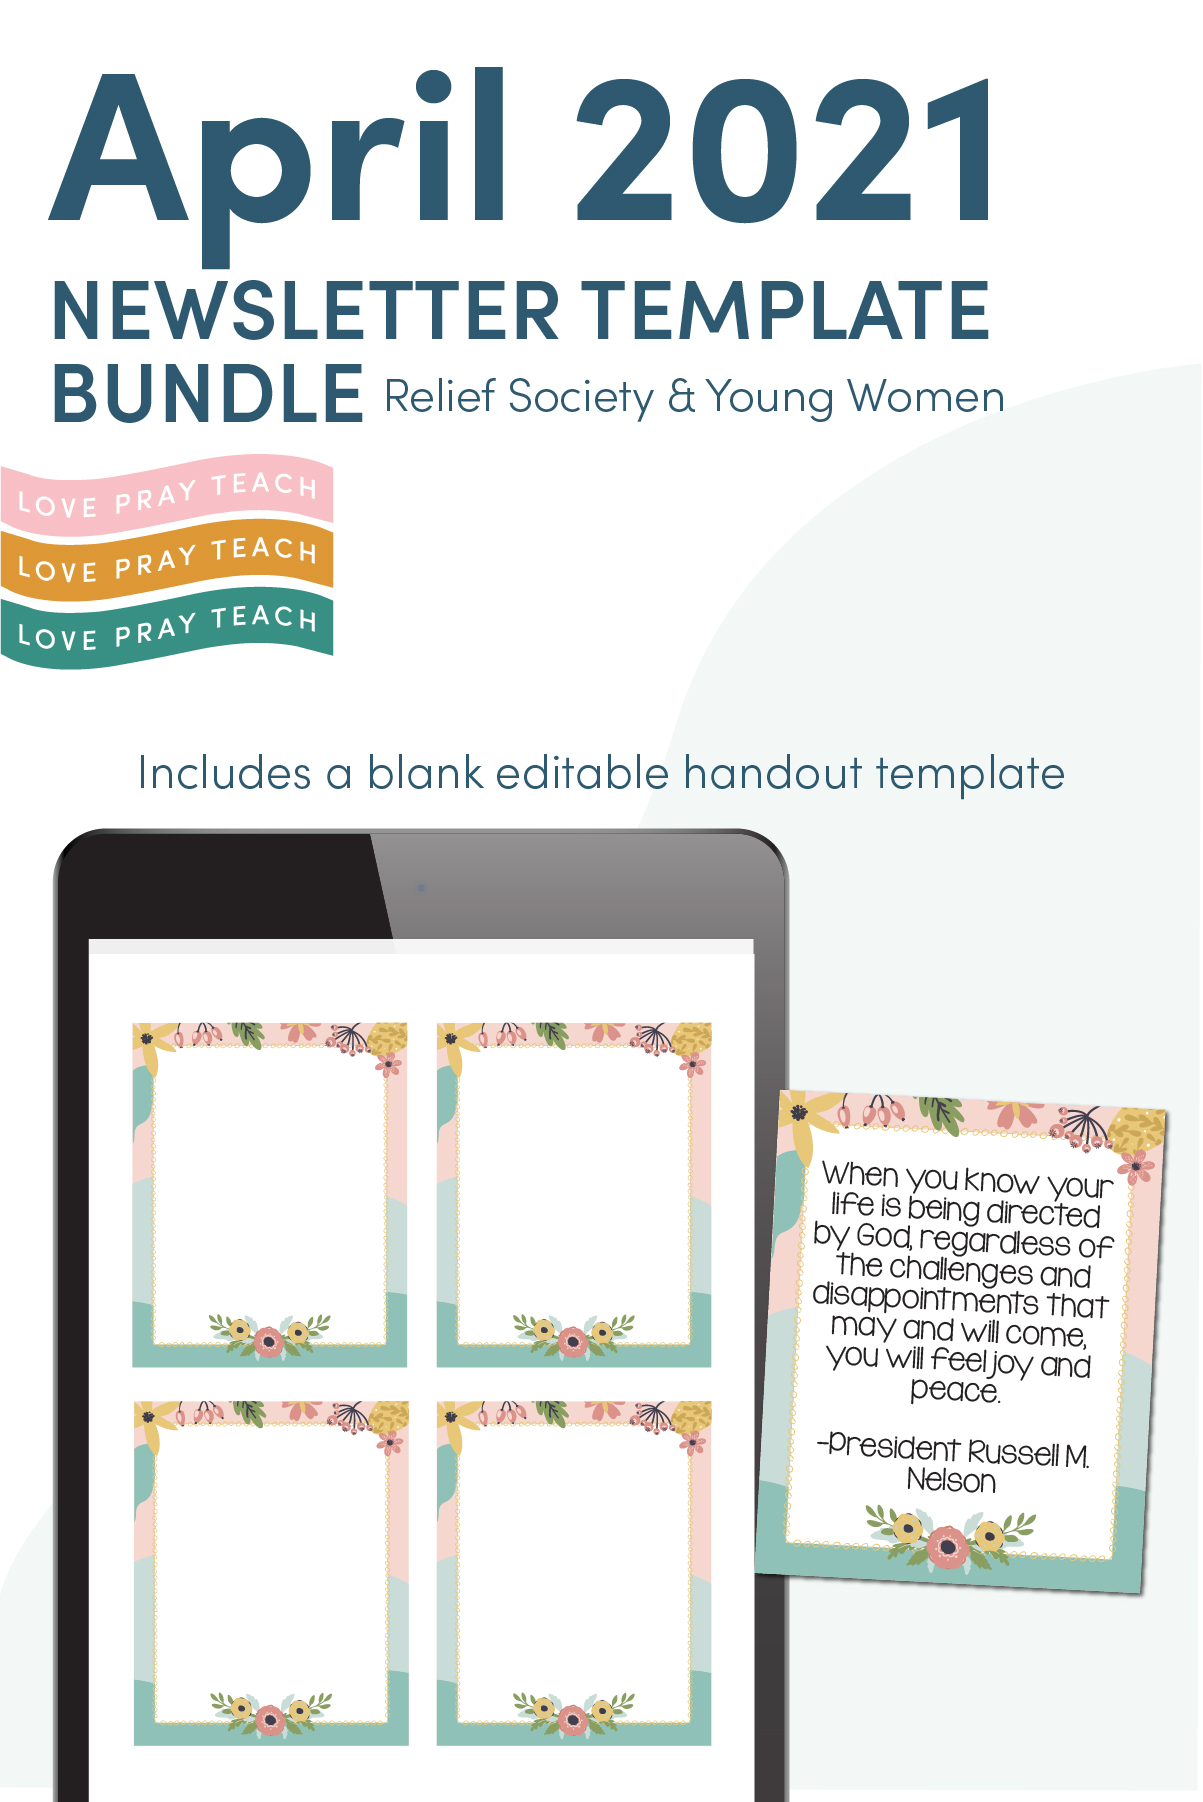 April 2021 Editable Newsletter Bundle